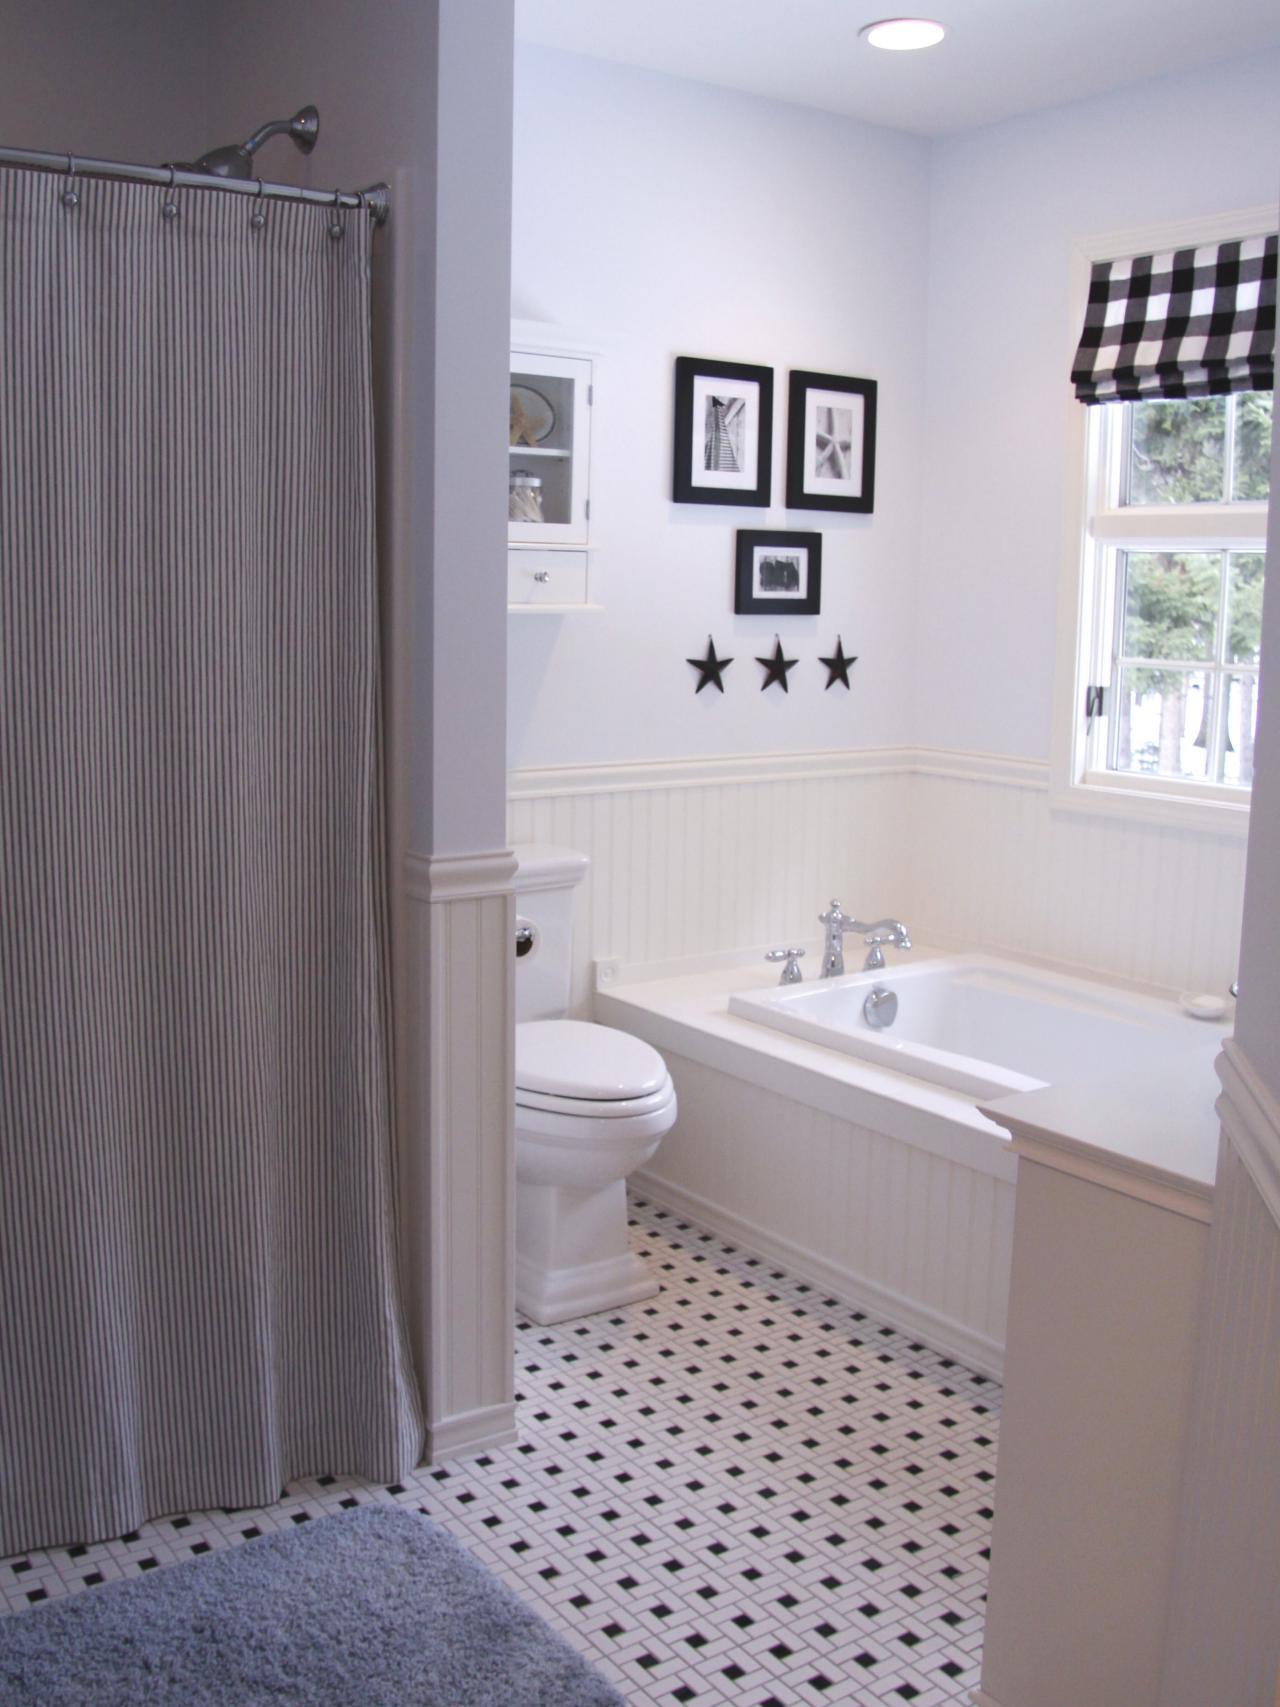 RMS_barbara61-black-white-country-style-bathroom_s3x4.jpg.rend.hgtvcom.1280.1707